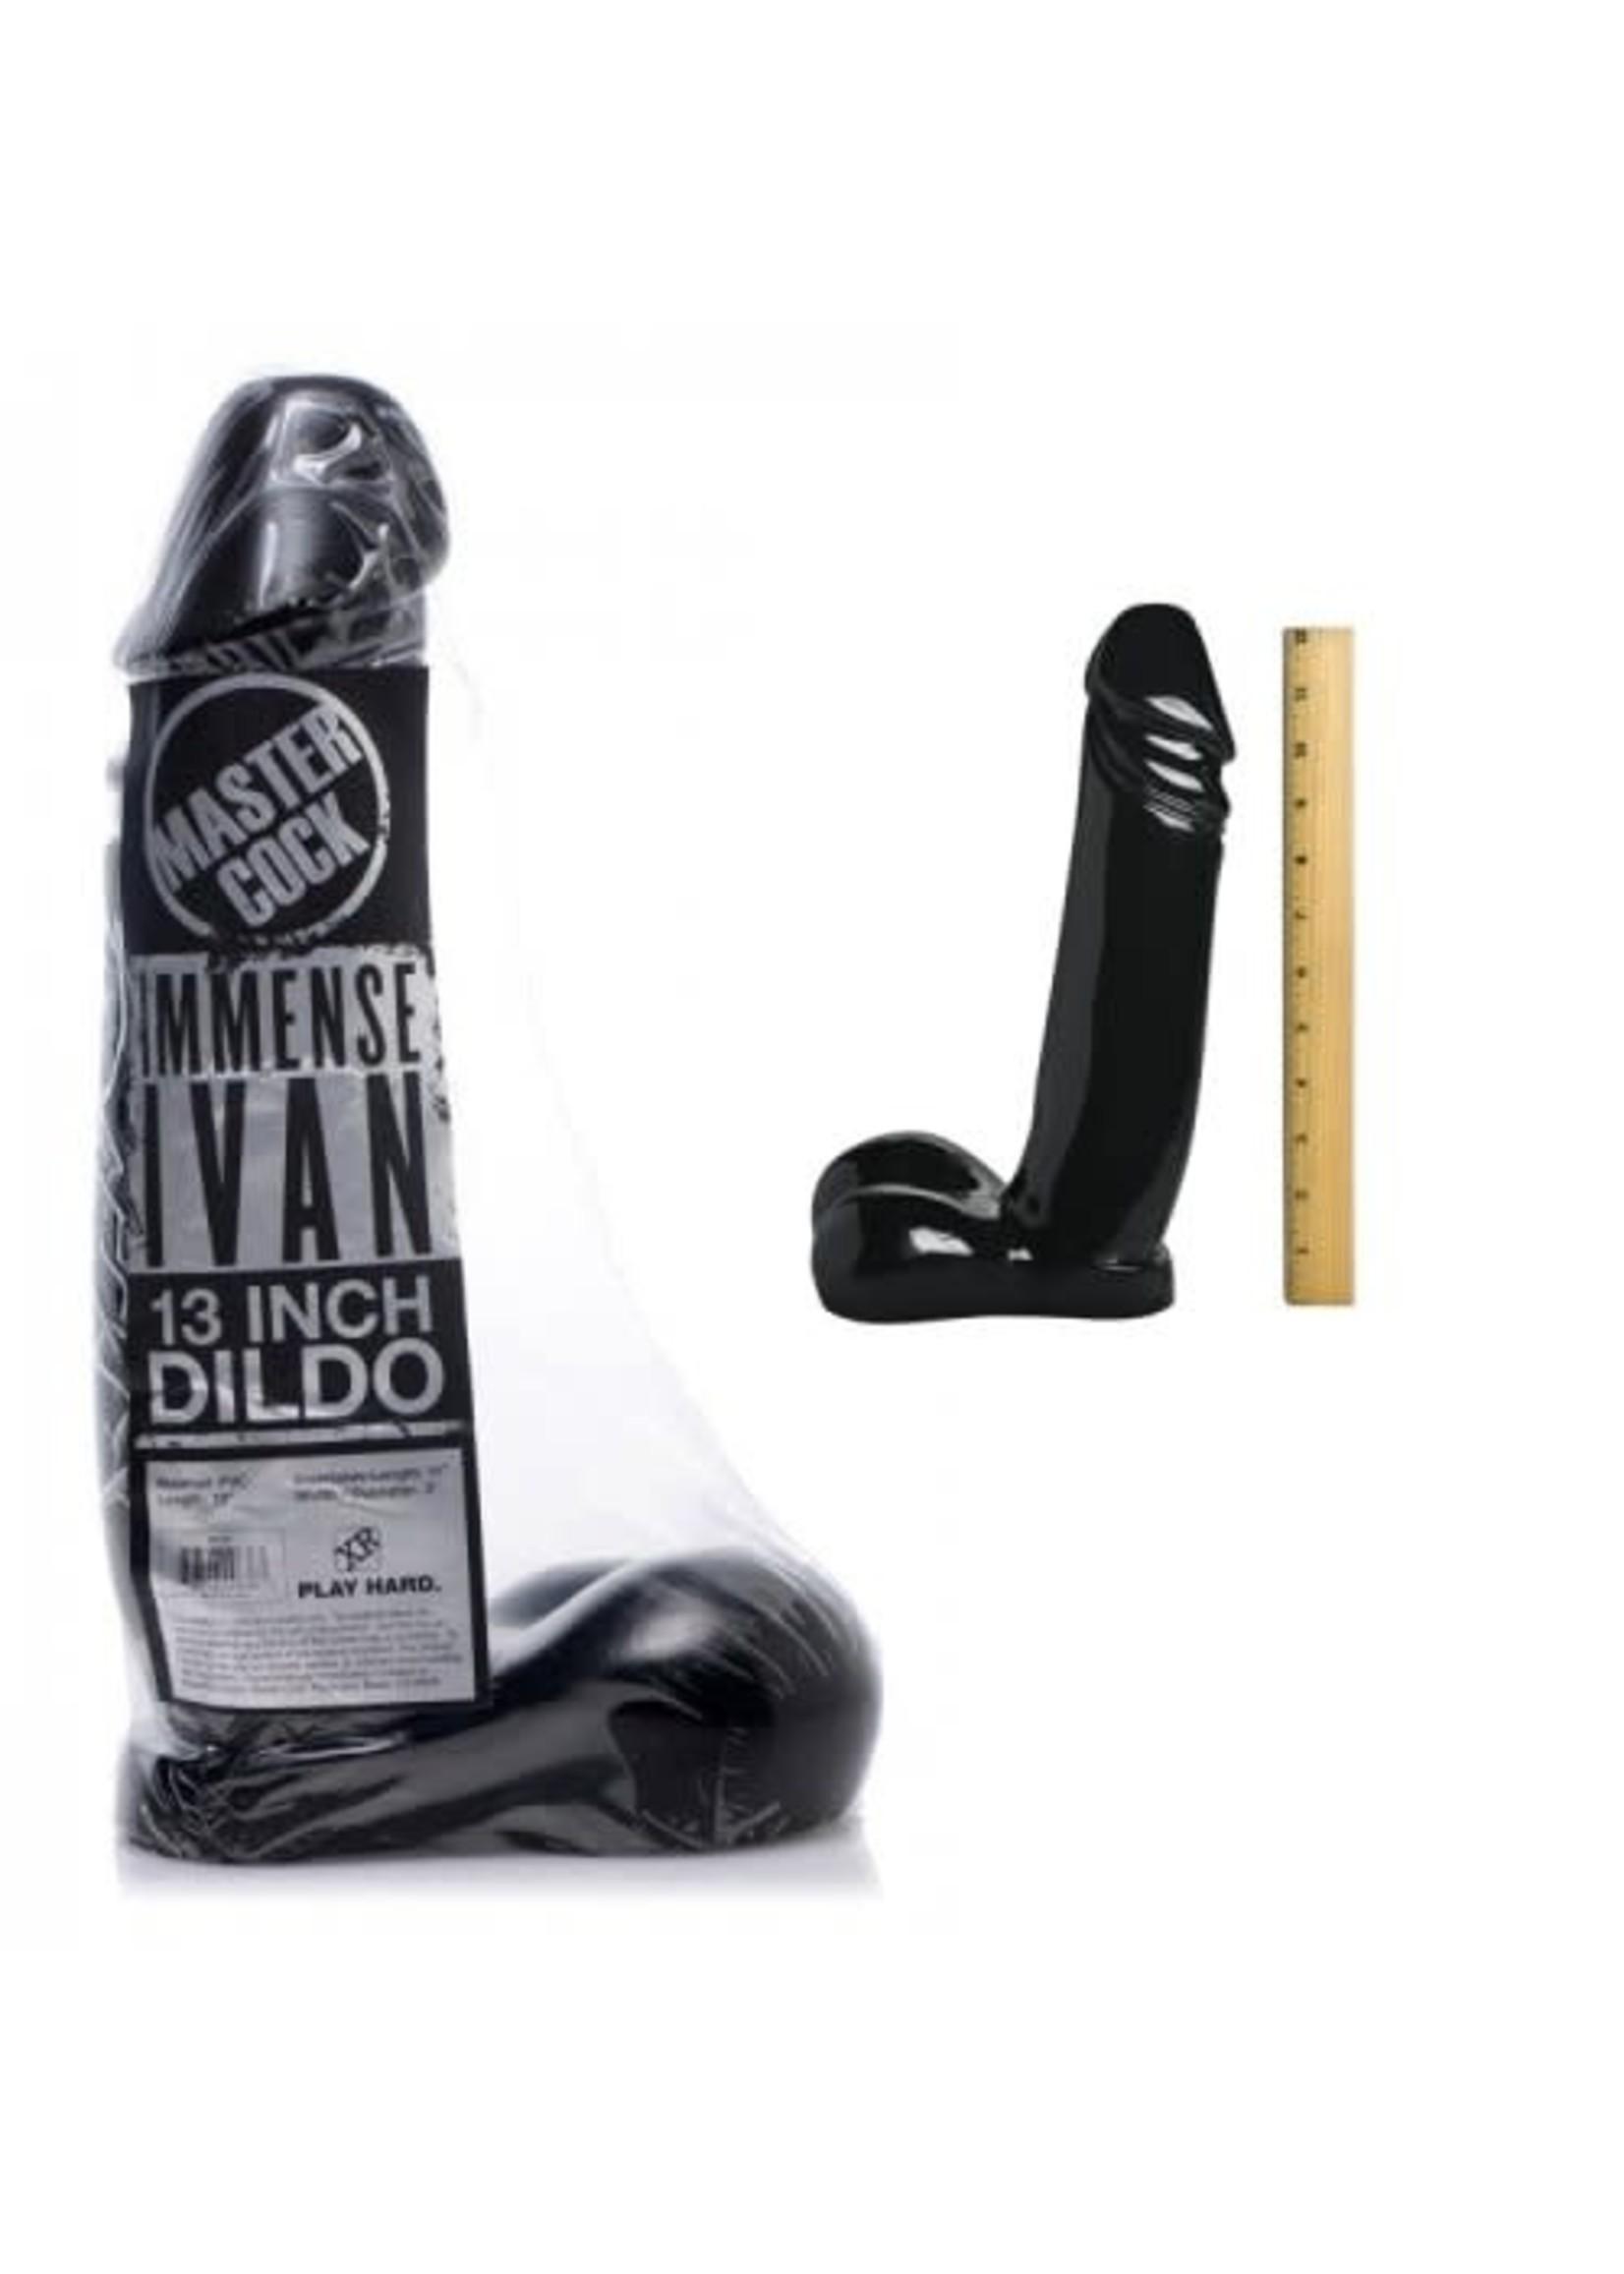 Master Cock Immense Ivan Dildo